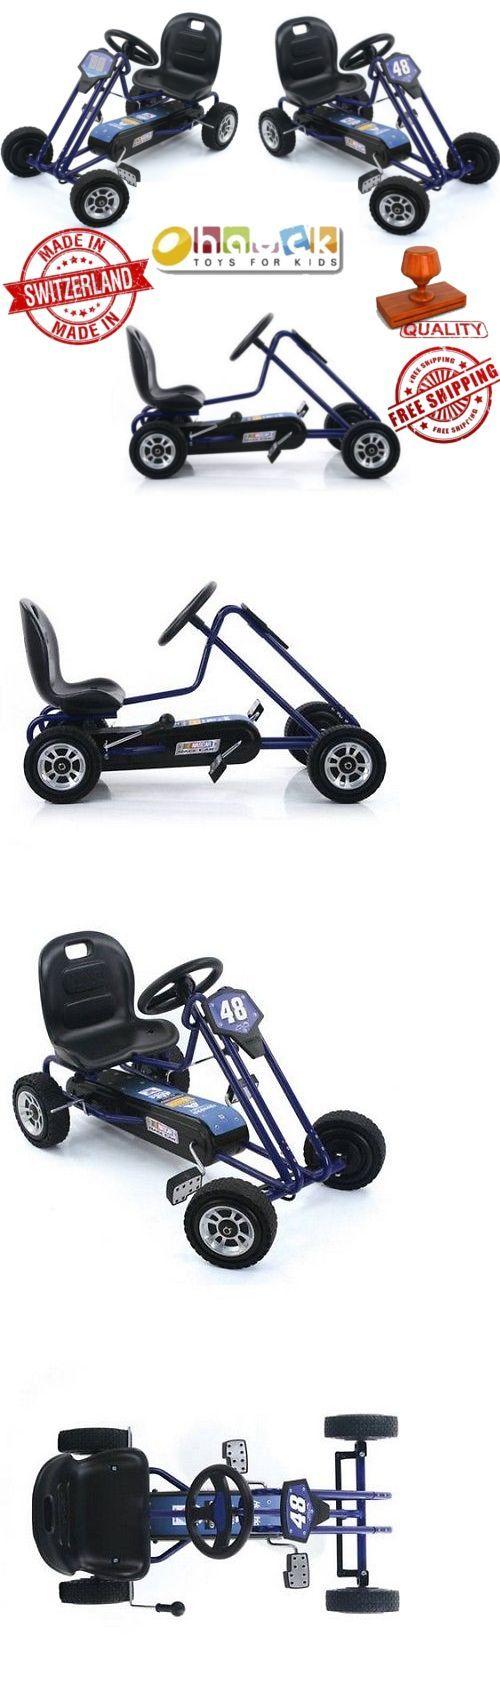 Complete Go-Karts and Frames 64656: Ride On Go Kart Nascar Pedal Car Kids Outdoor Junior Toy Racing Steel Go Kart -> BUY IT NOW ONLY: $150.51 on eBay!